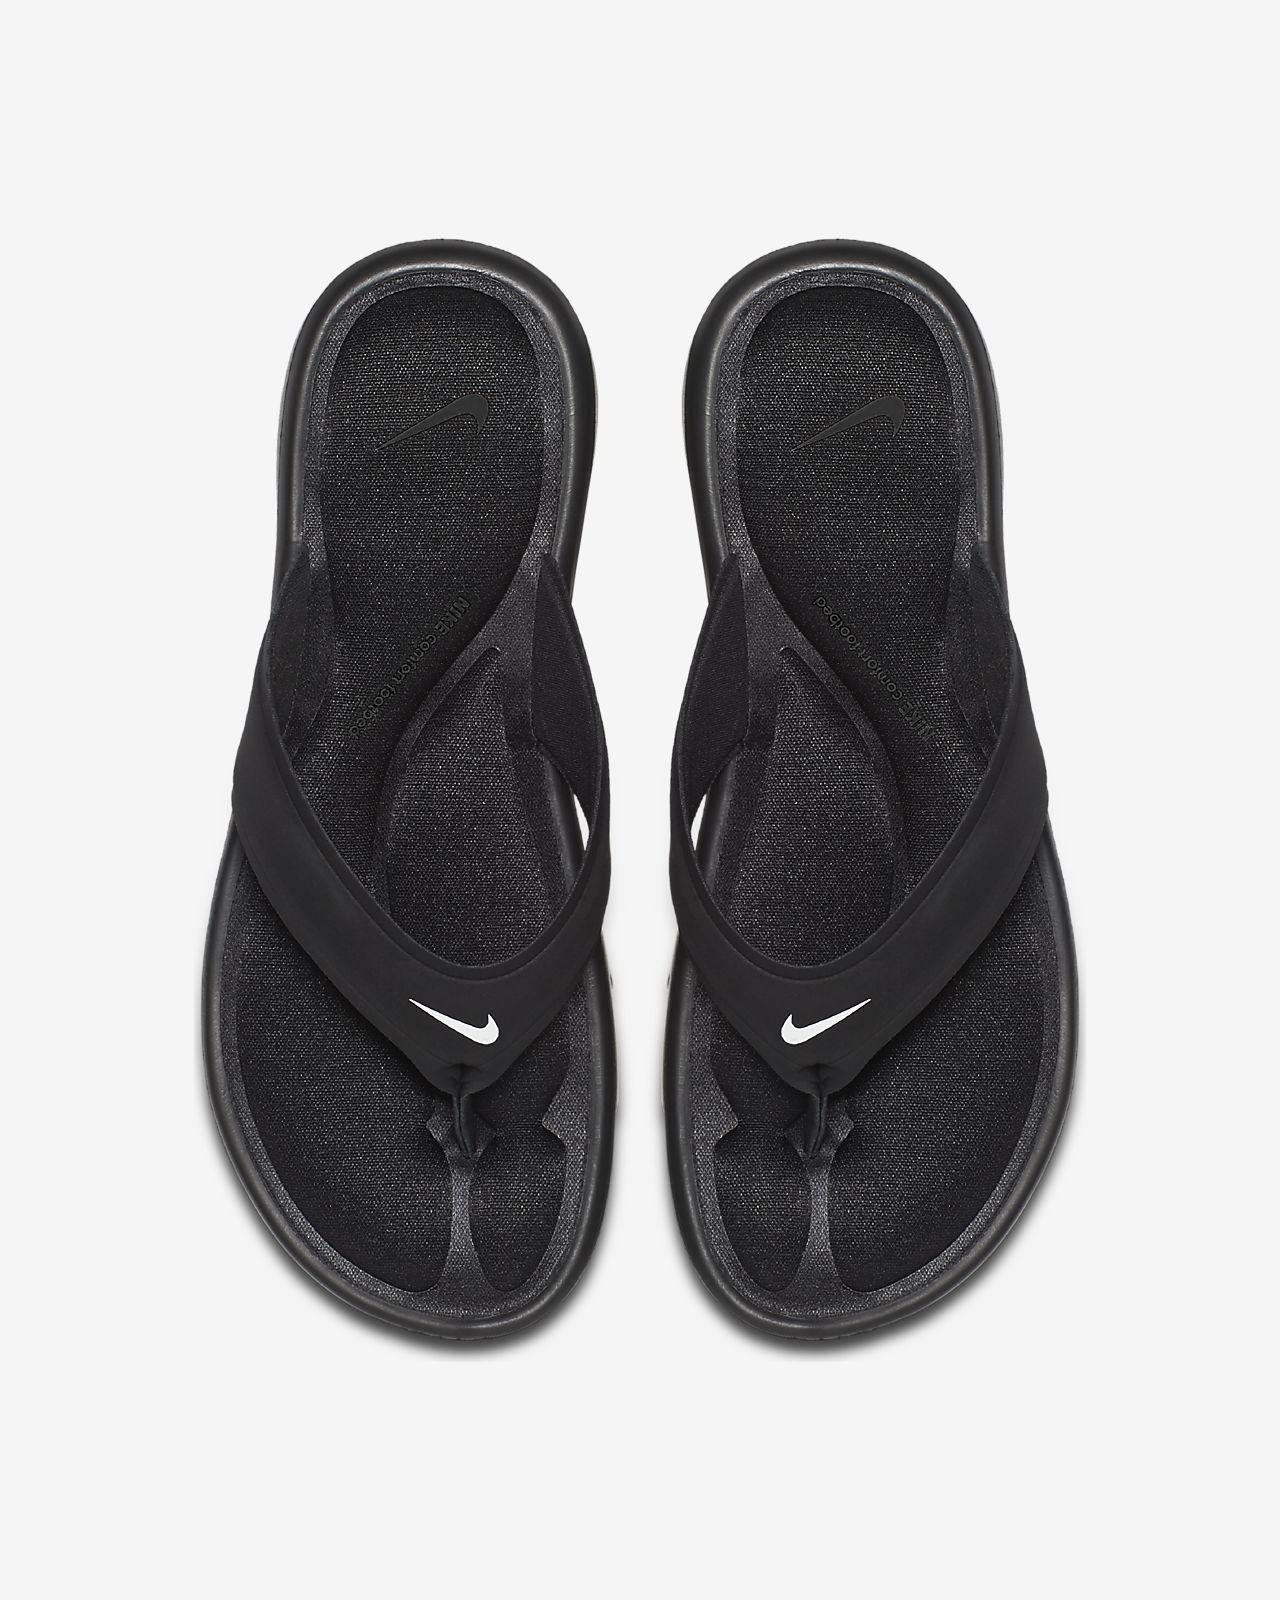 1e69330235e6 ... sandals 882697 001 black 514f5 039fb  best price nike ultra comfort  womens flip flop 6b43b d4005